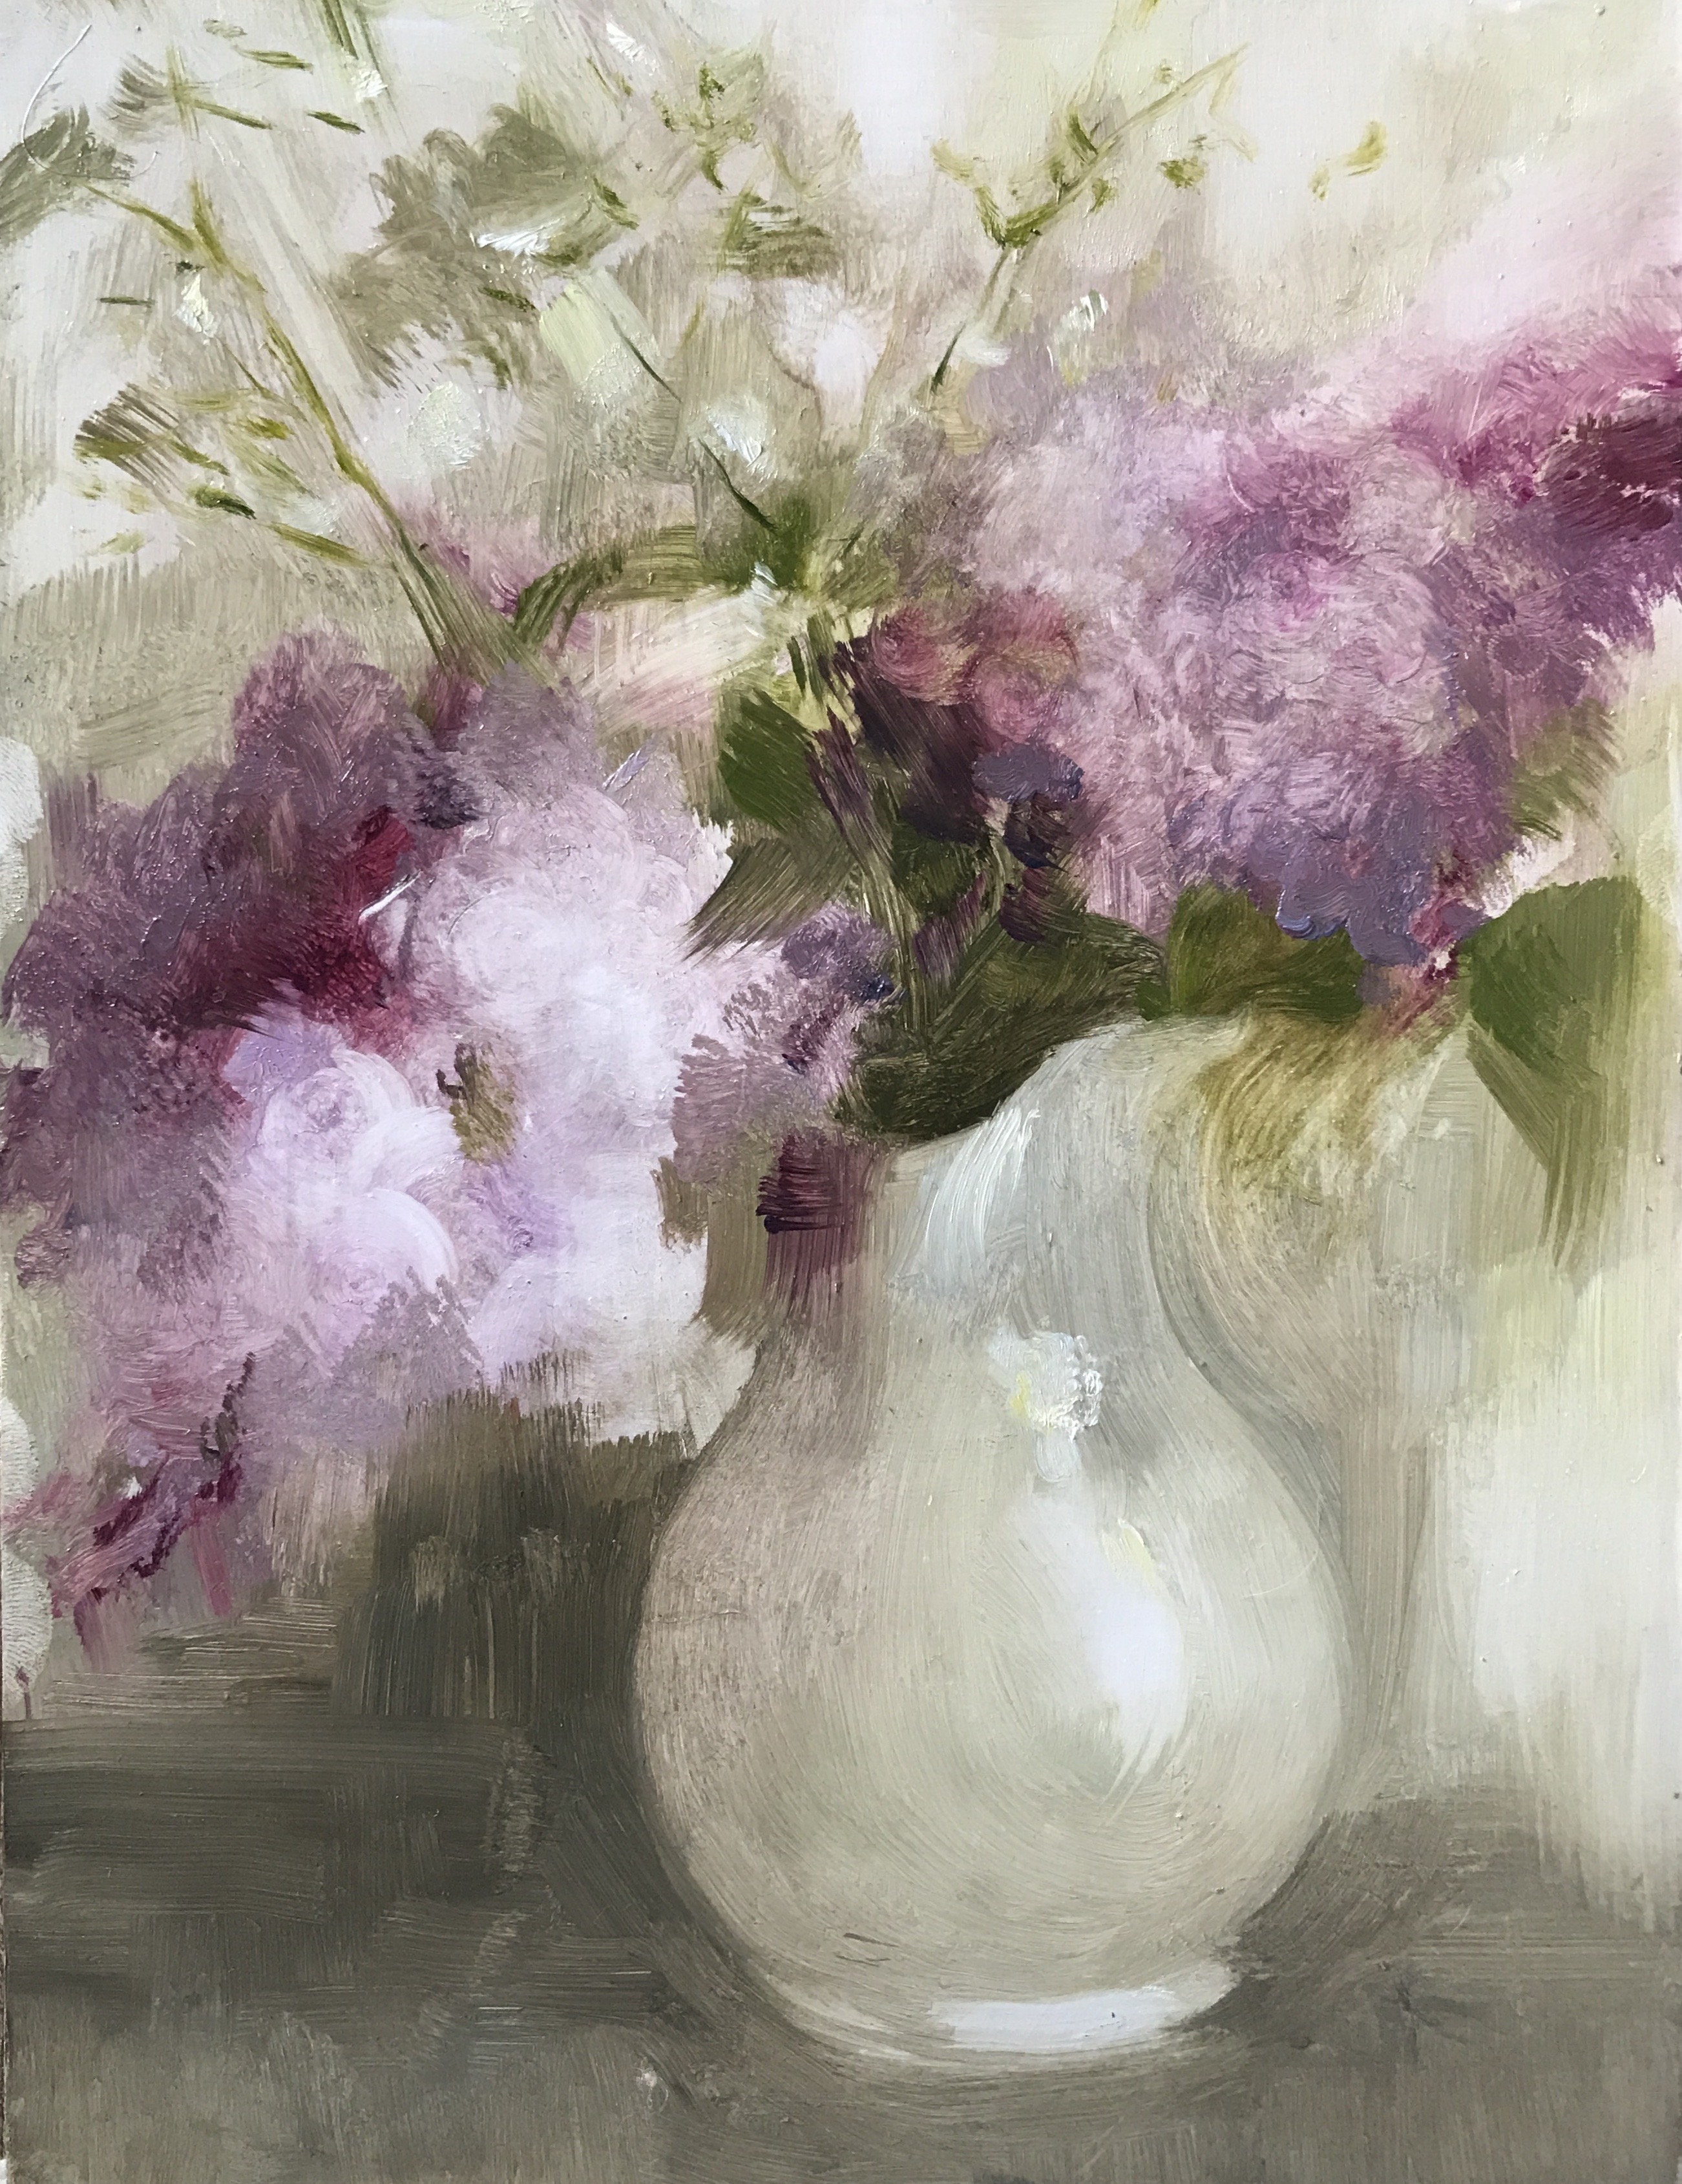 Lilac & White Ceramic